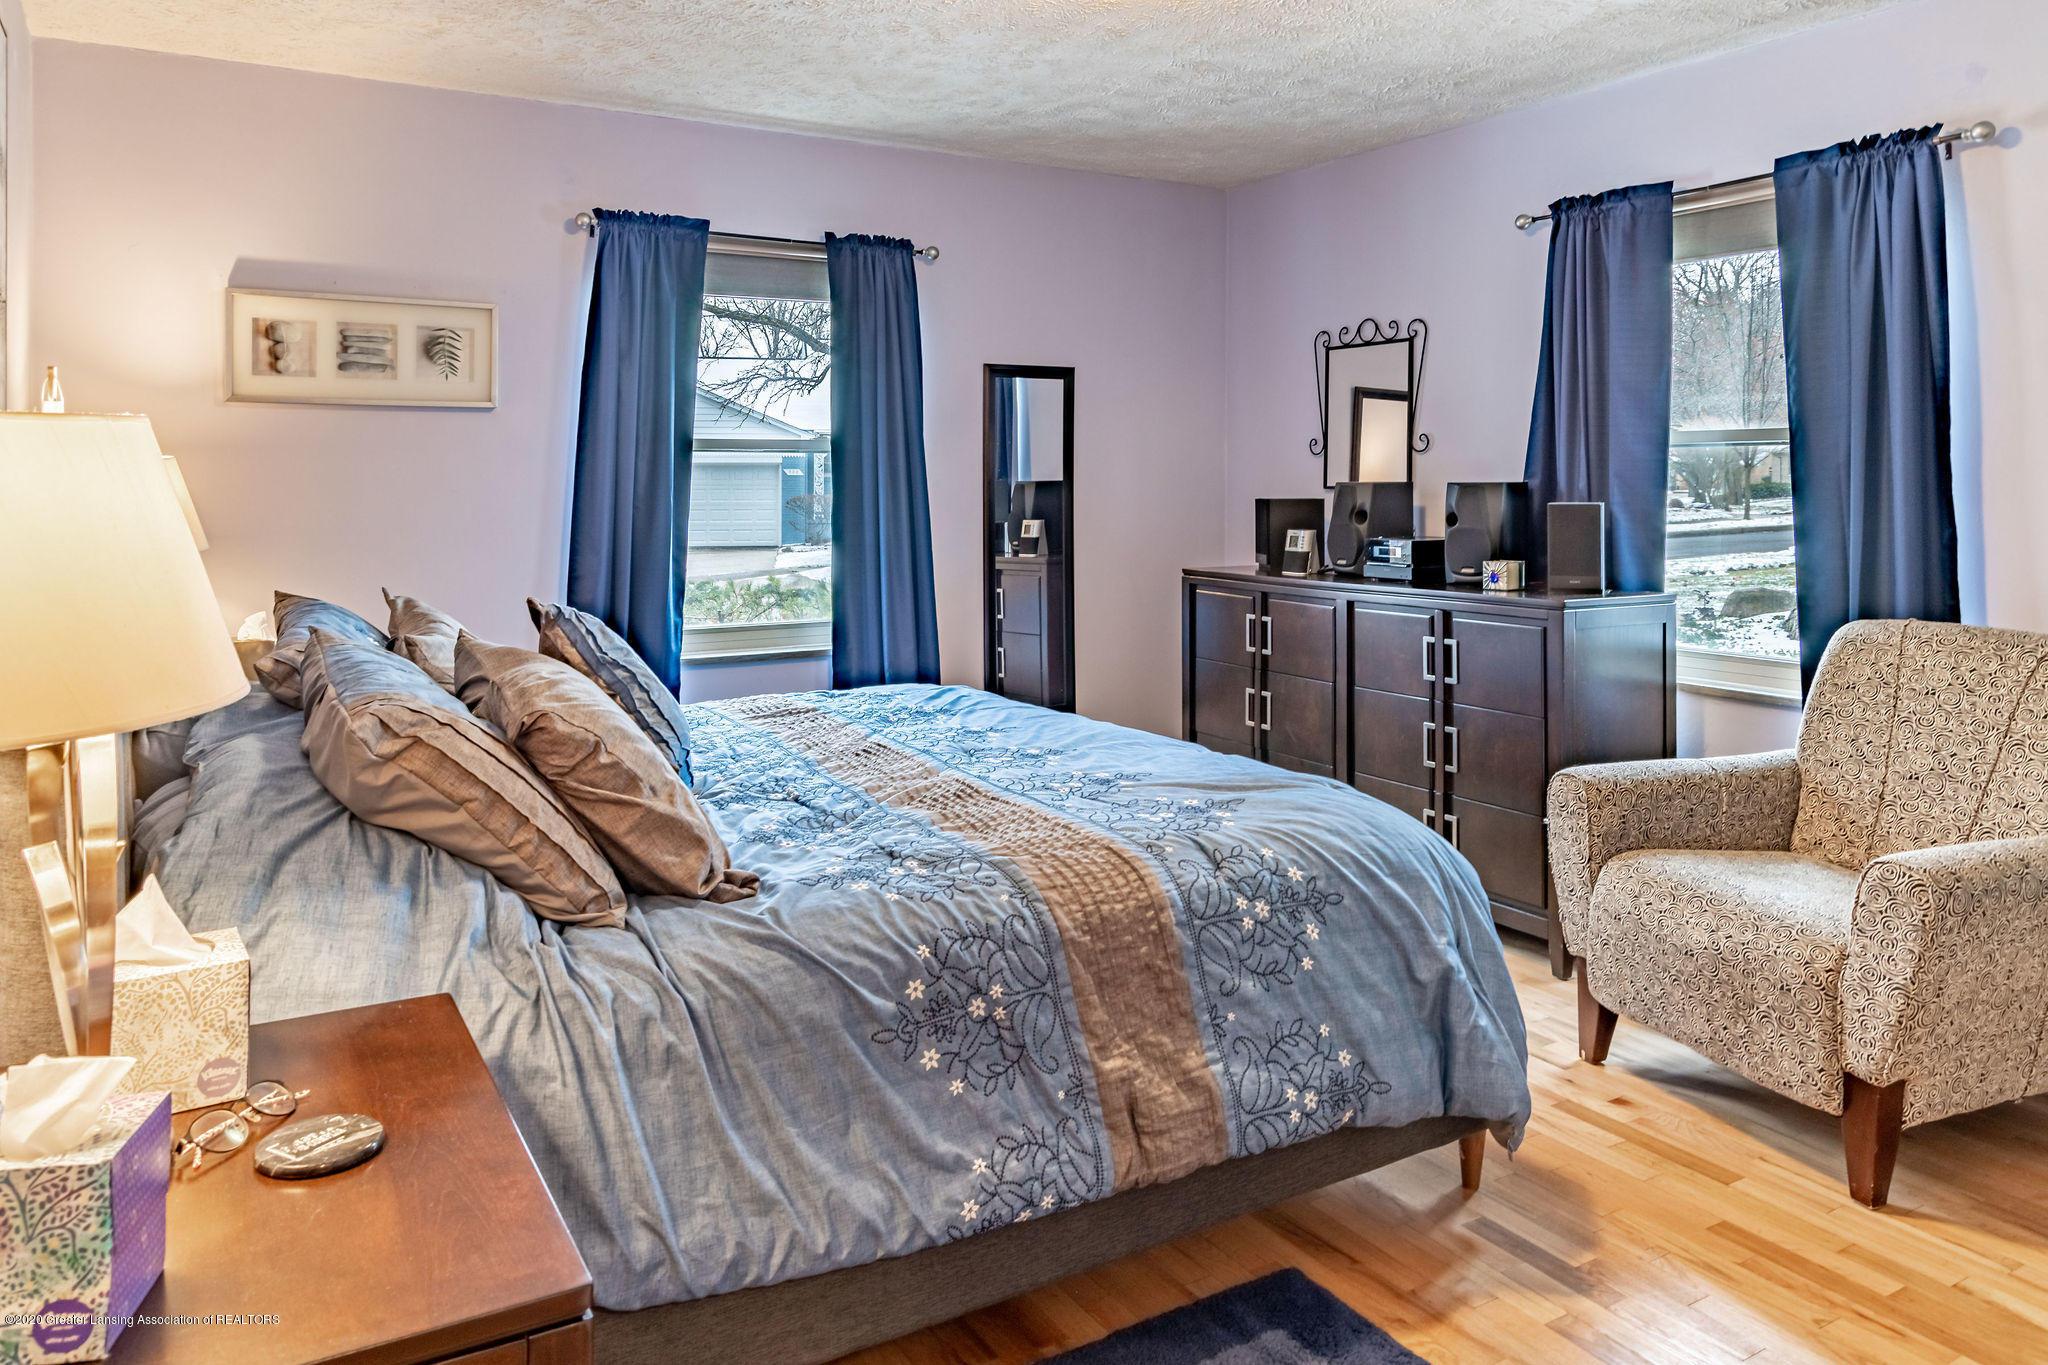 945 Audubon Rd - bedroom 1 - 11